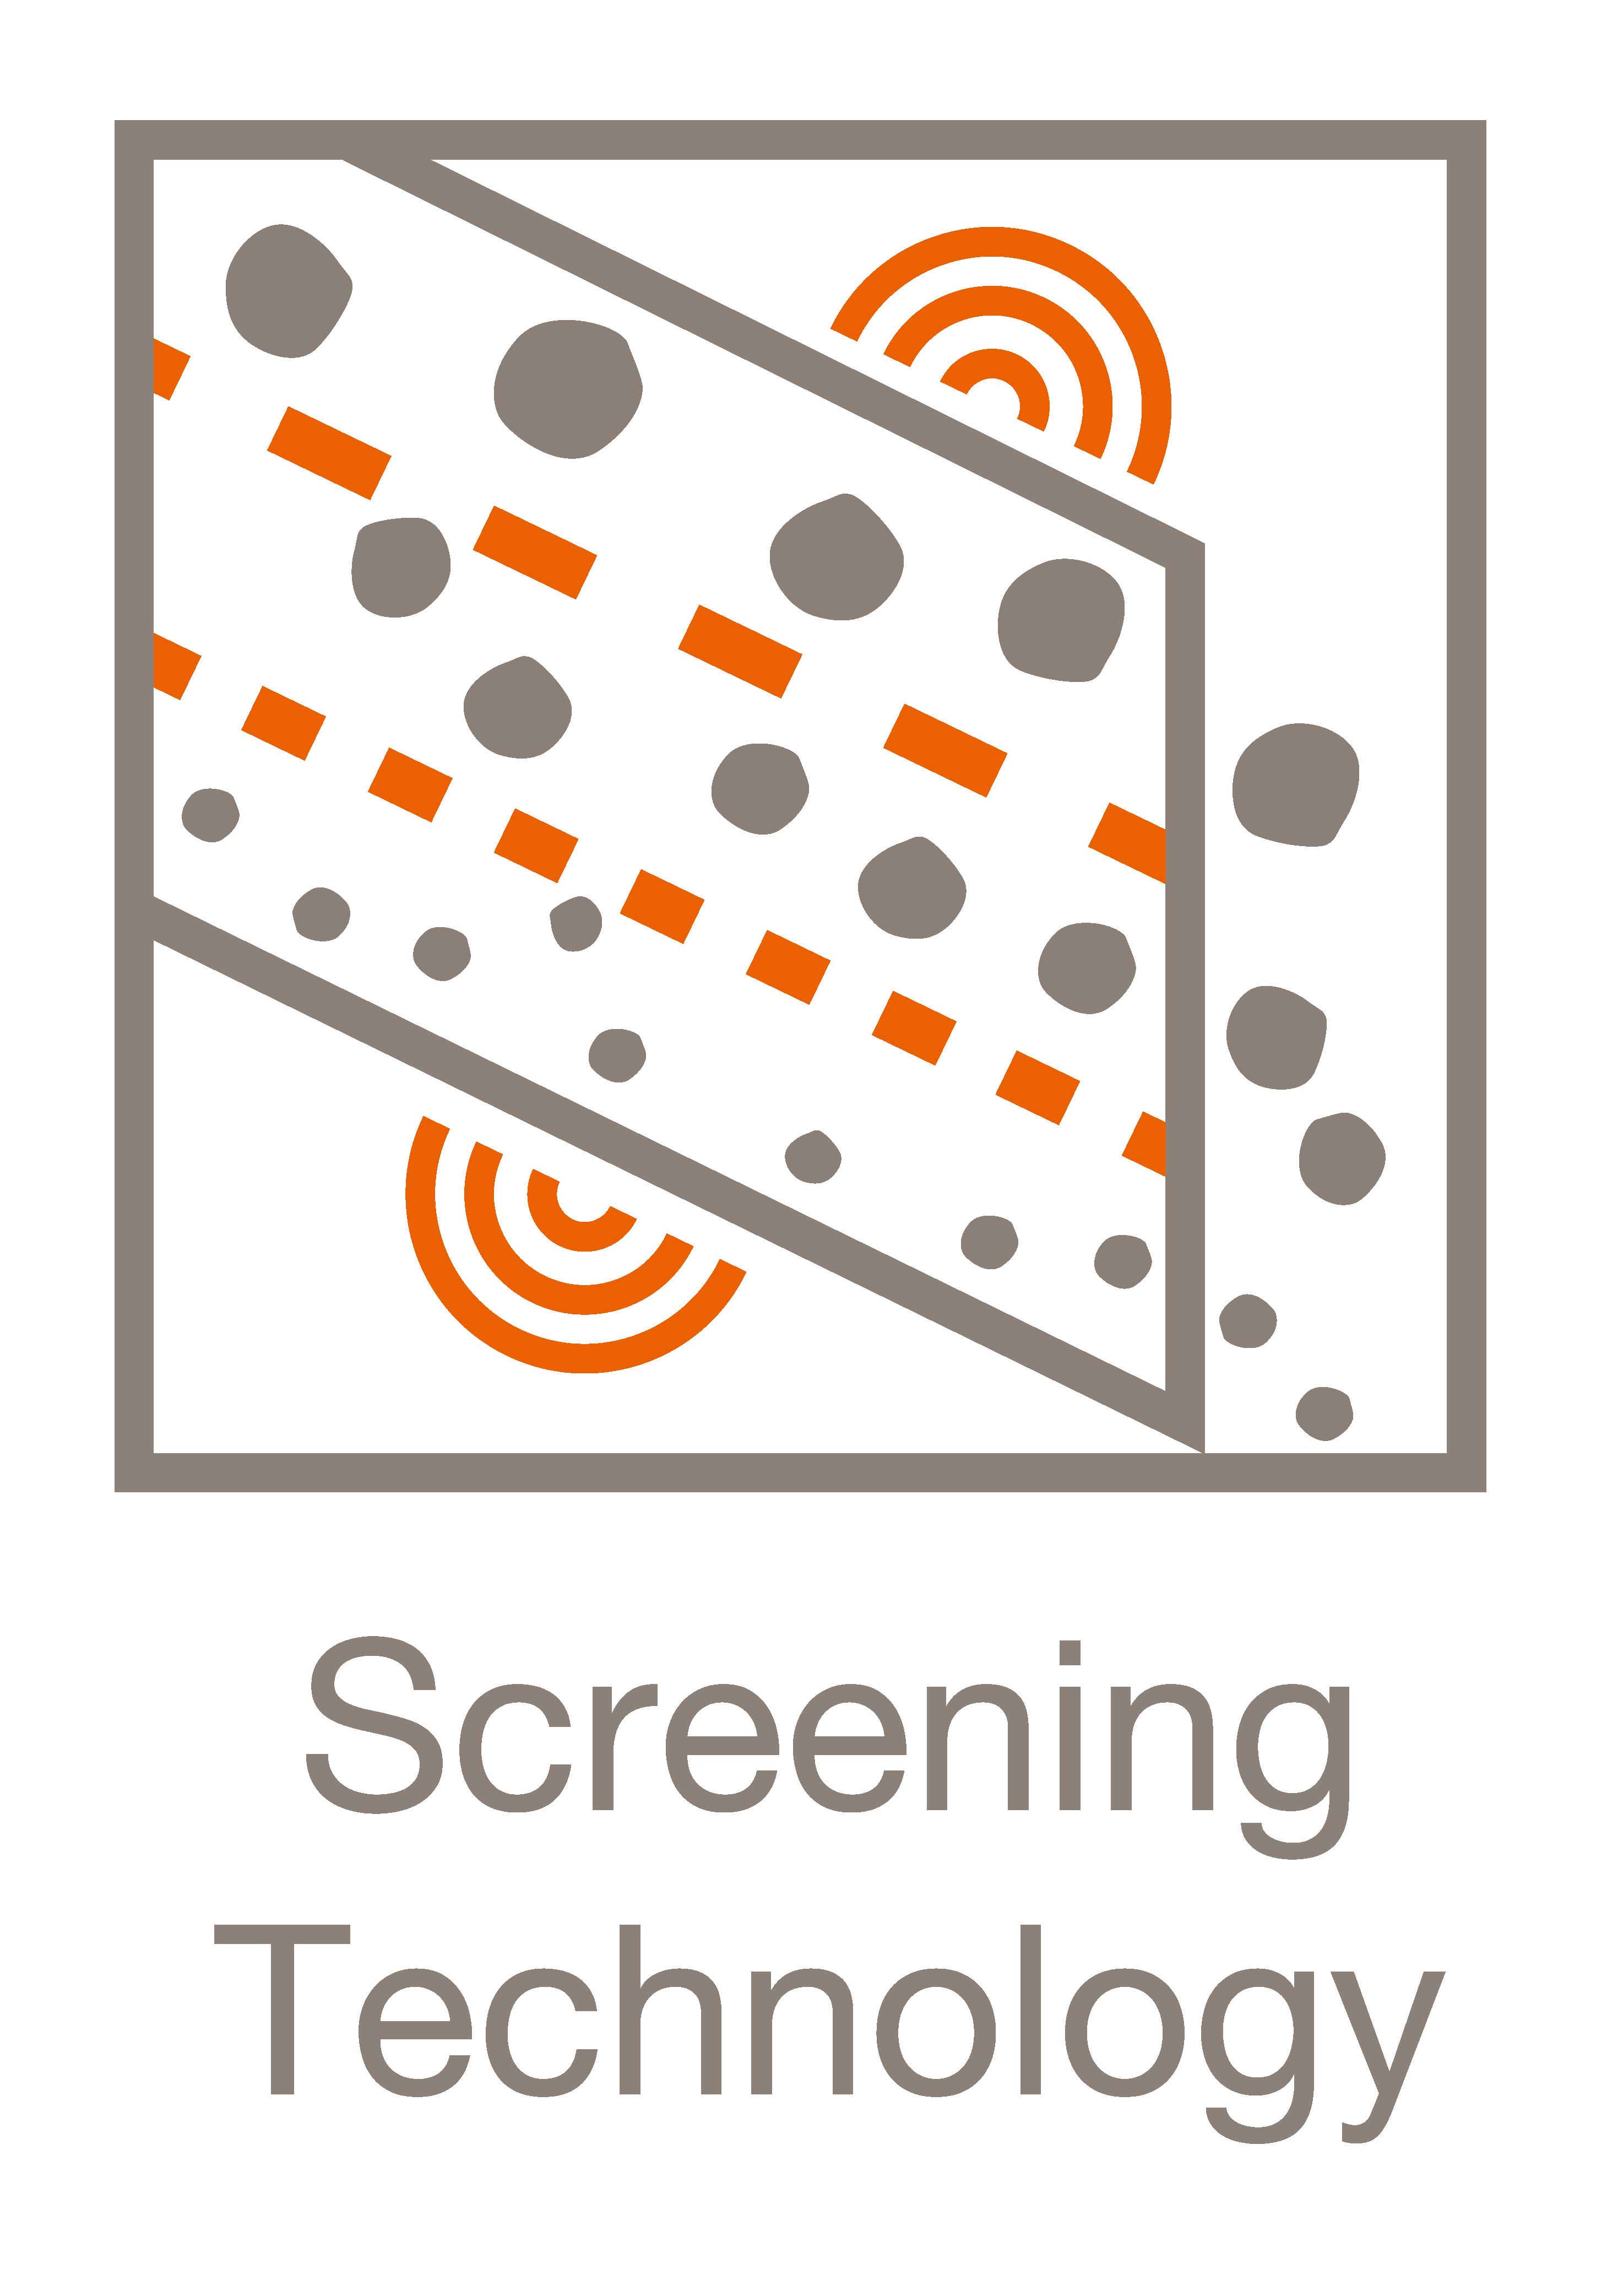 Screening Technology